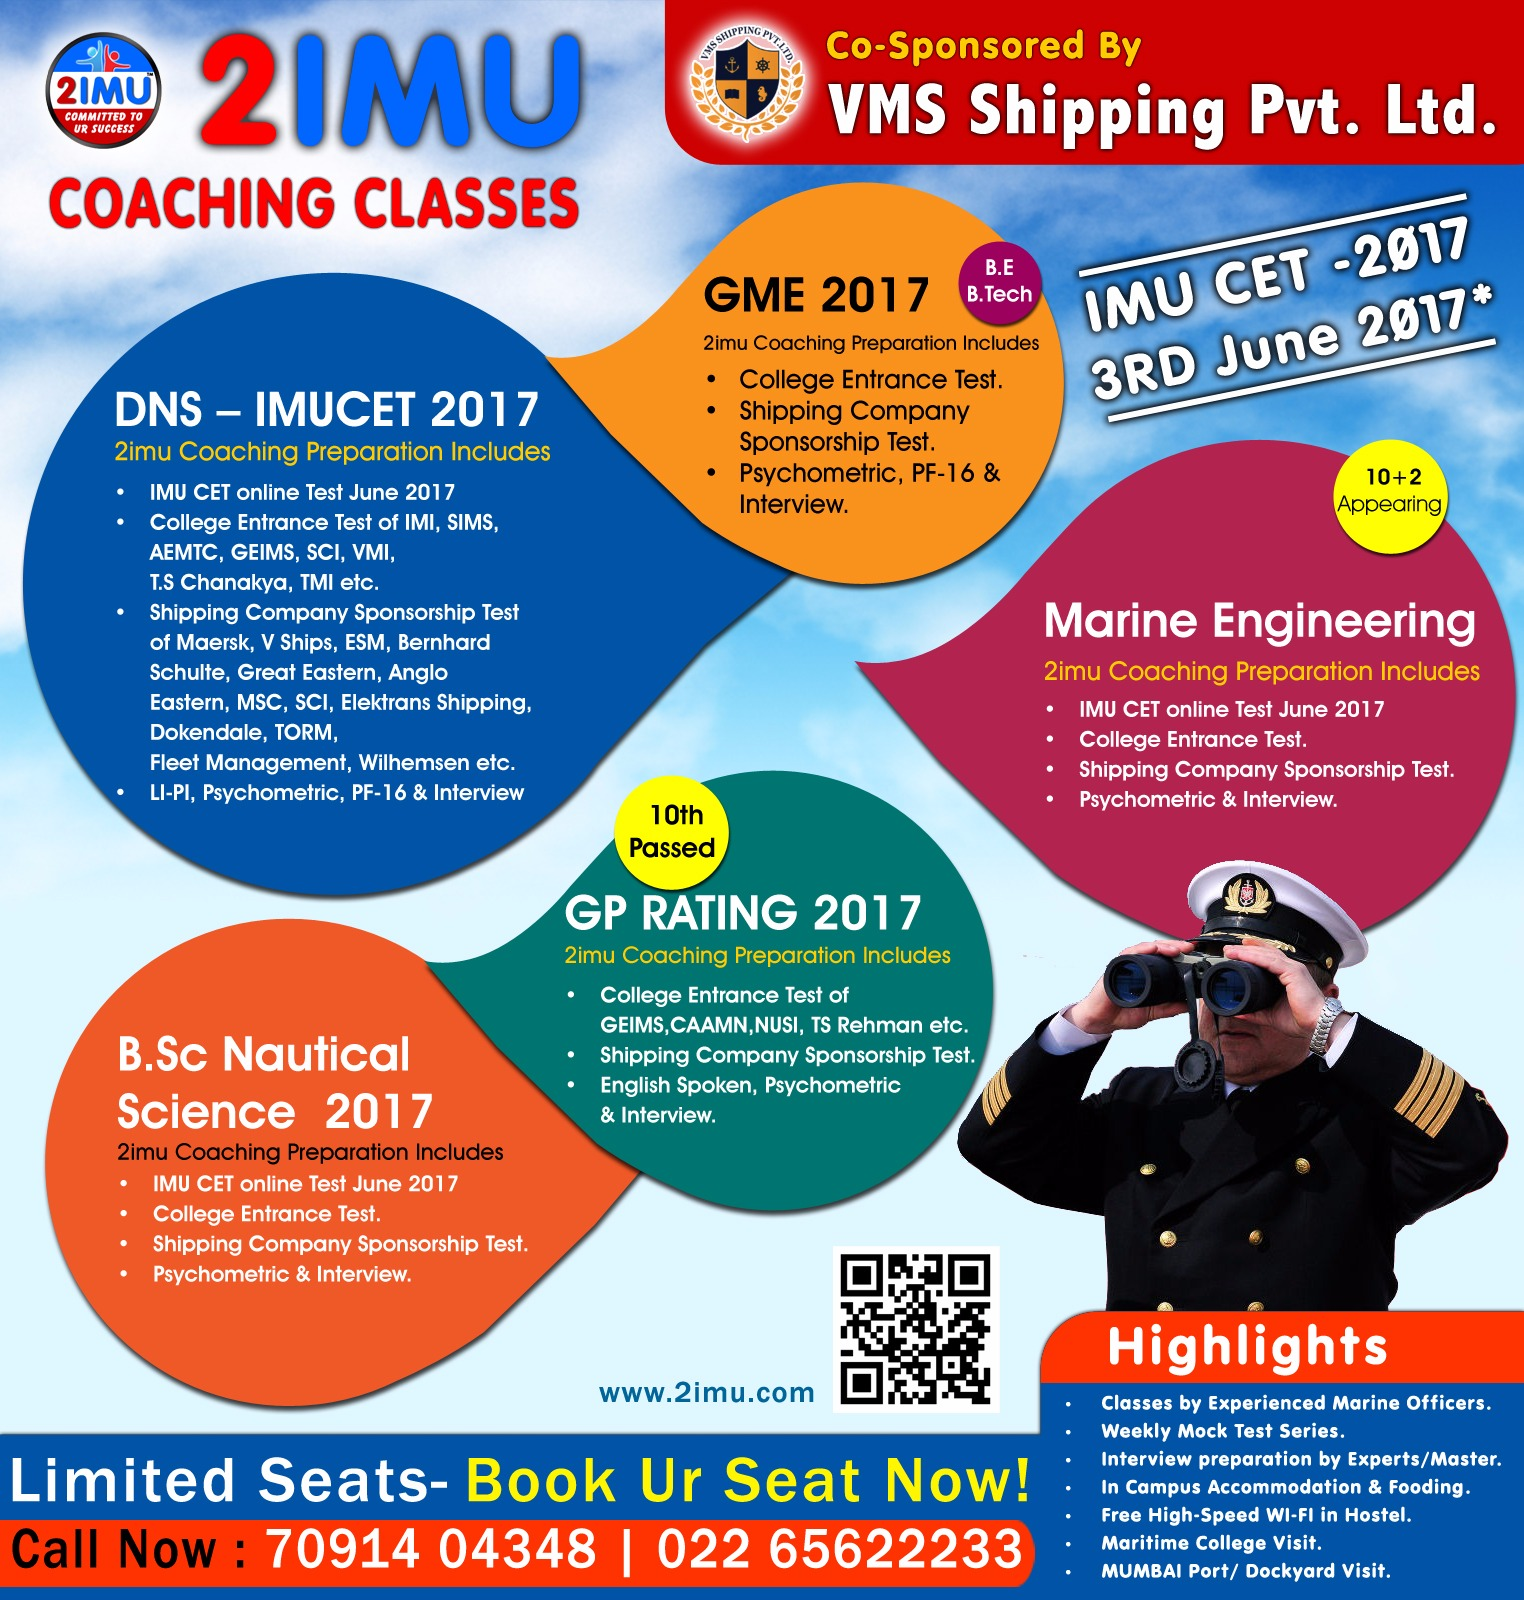 IMU-CET Coaching Classes in Mumbai|Delhi|Lucknow| Chandigarh|Patna | Chennai